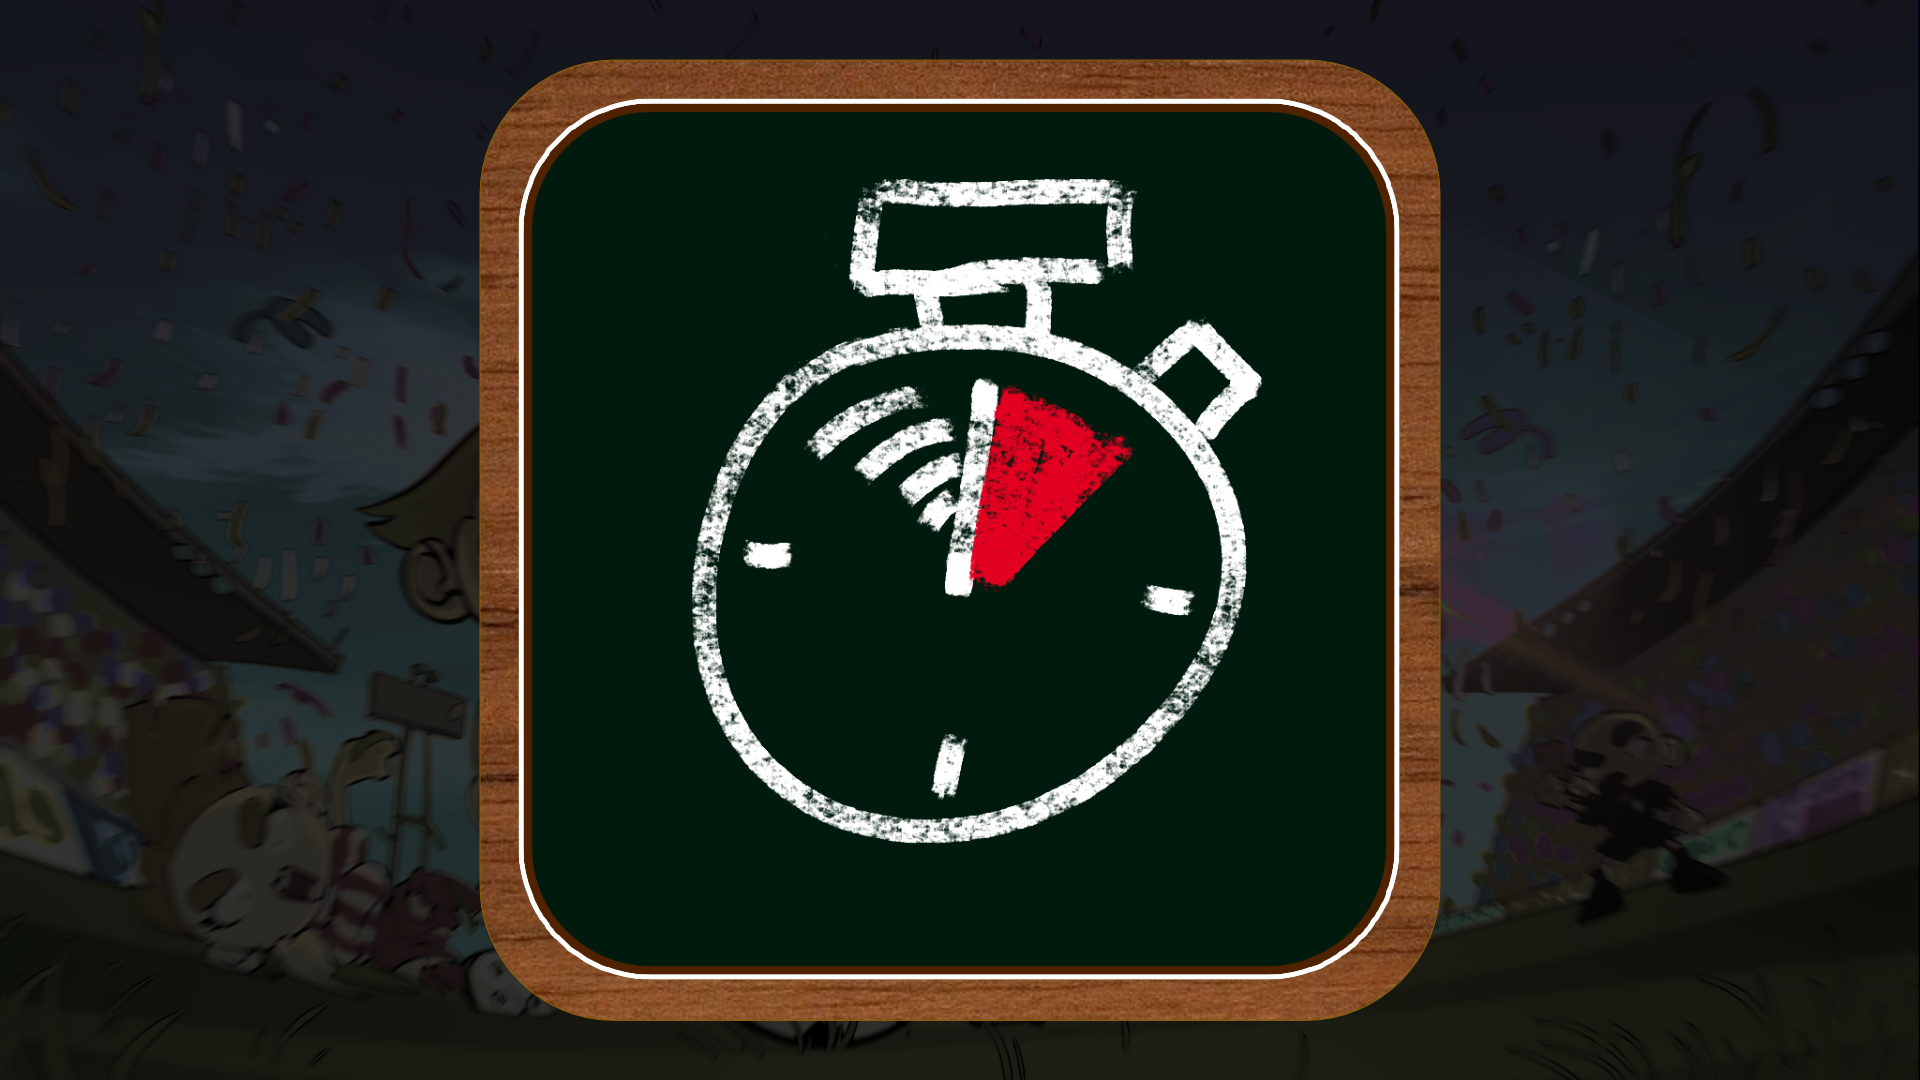 Icon for Last breath